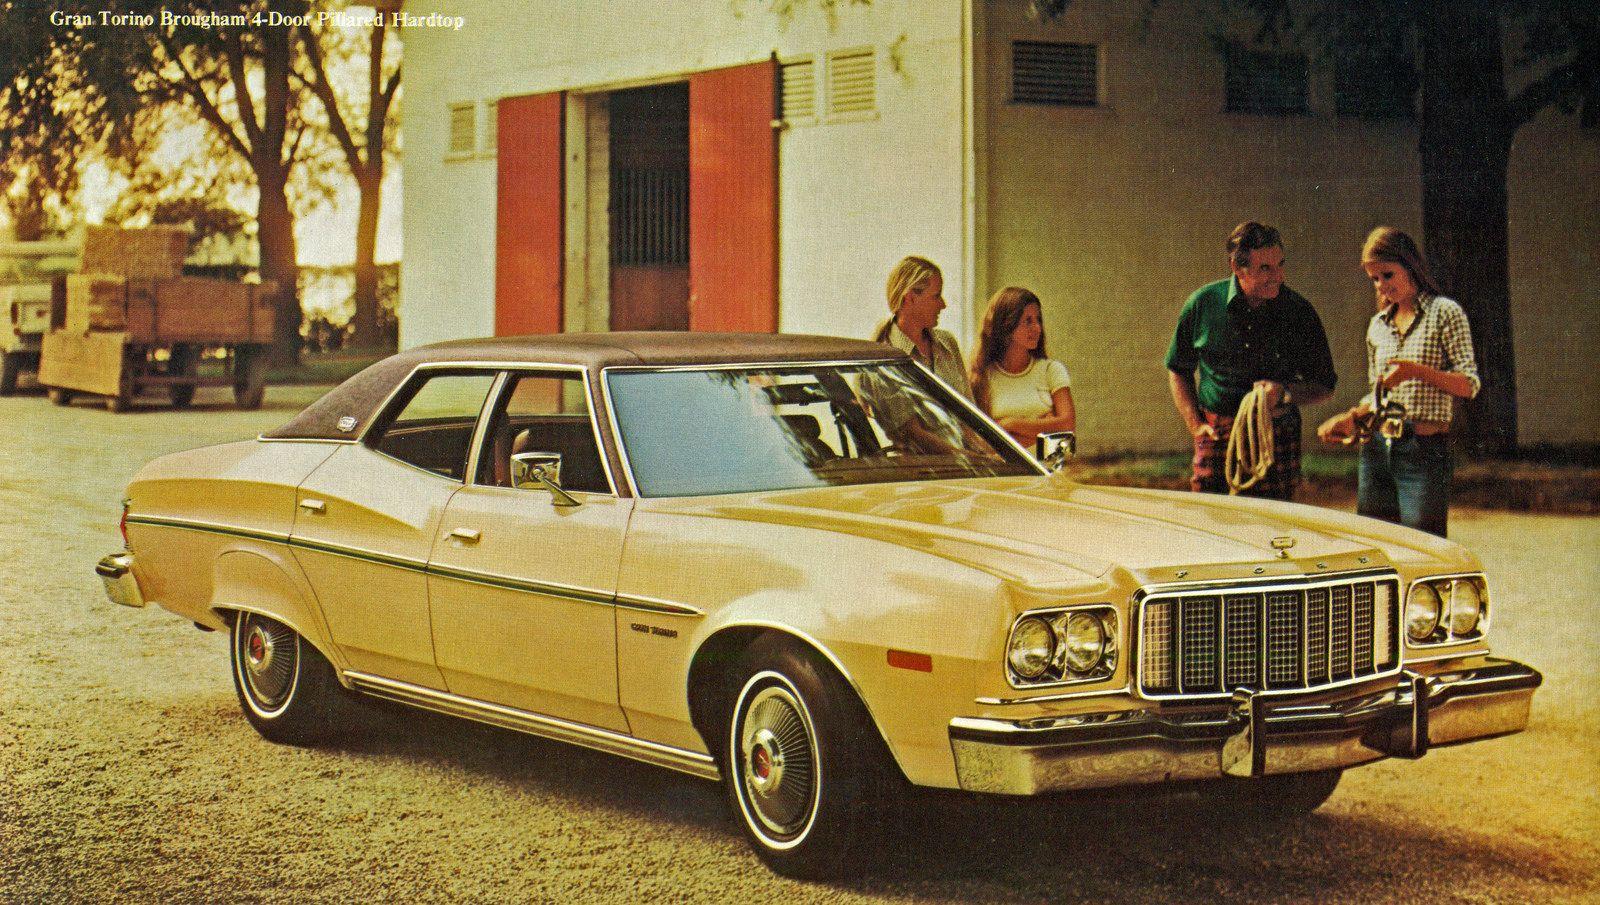 1976 Ford Gran Torino Brougham 4 Door Pillard Hardtop Cars Usa Ford Torino Ford